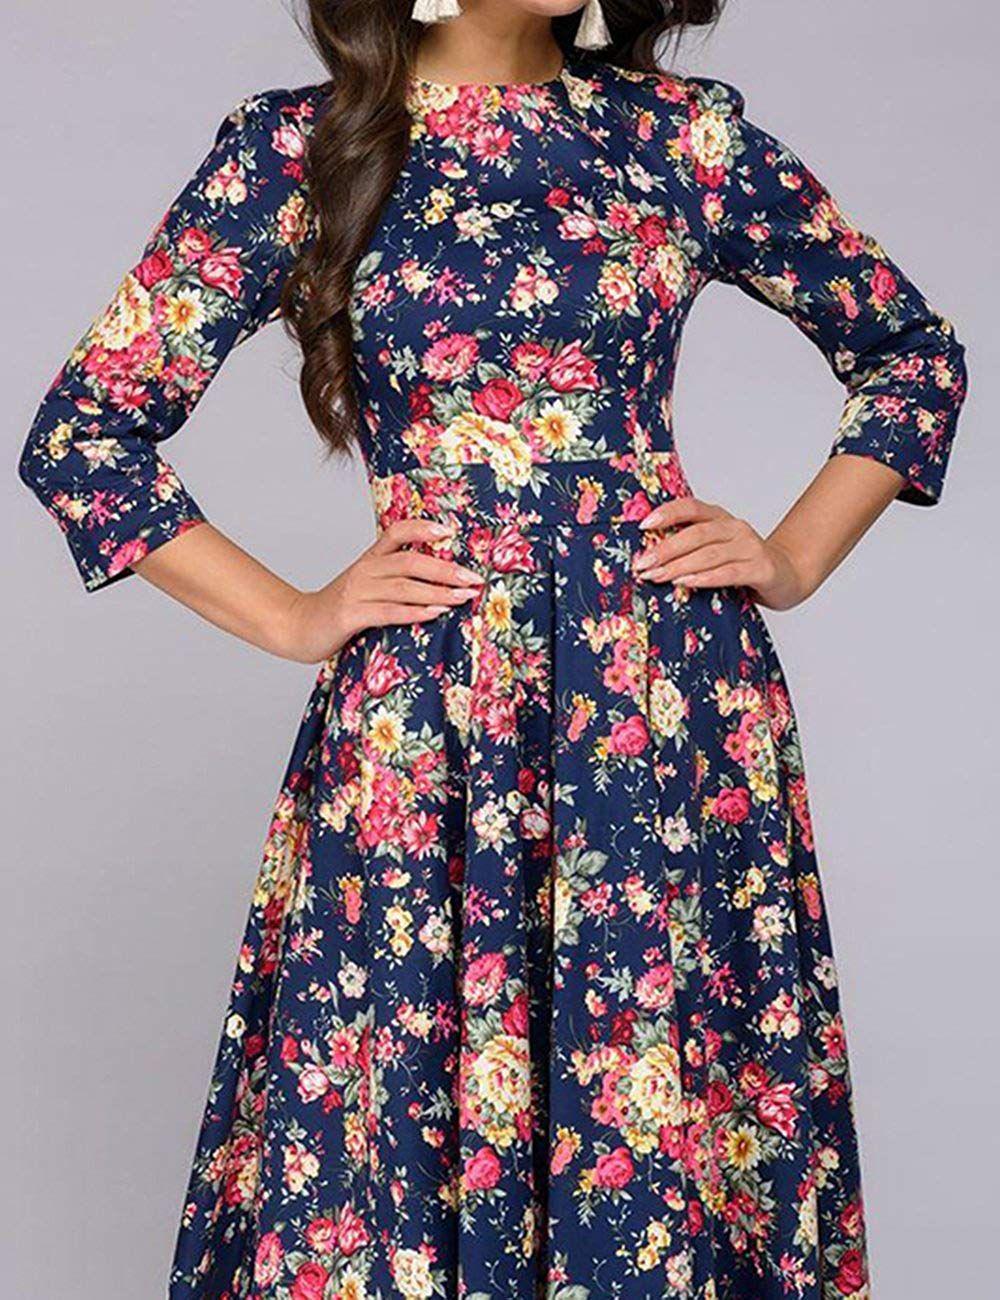 Simple Flavor Women S Vintage Maxi Dress 3 4 Sleeve Floral Long Dress Floor Length At Amazon Women S Clothing Vintage Maxi Dress Floral Dresses Long Maxi Dress [ 1300 x 1000 Pixel ]